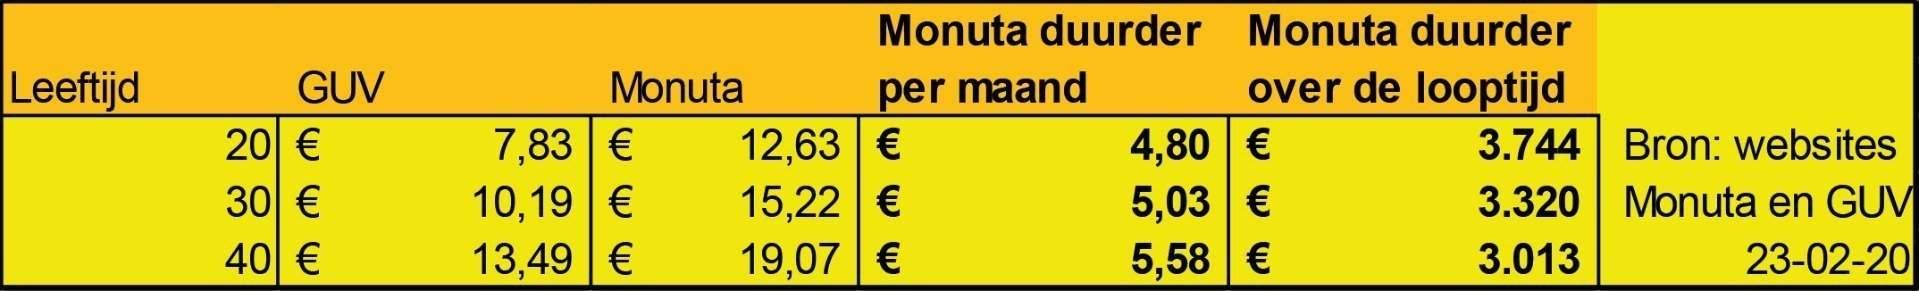 GUV duizenden euro's goedkoper dan Monuta